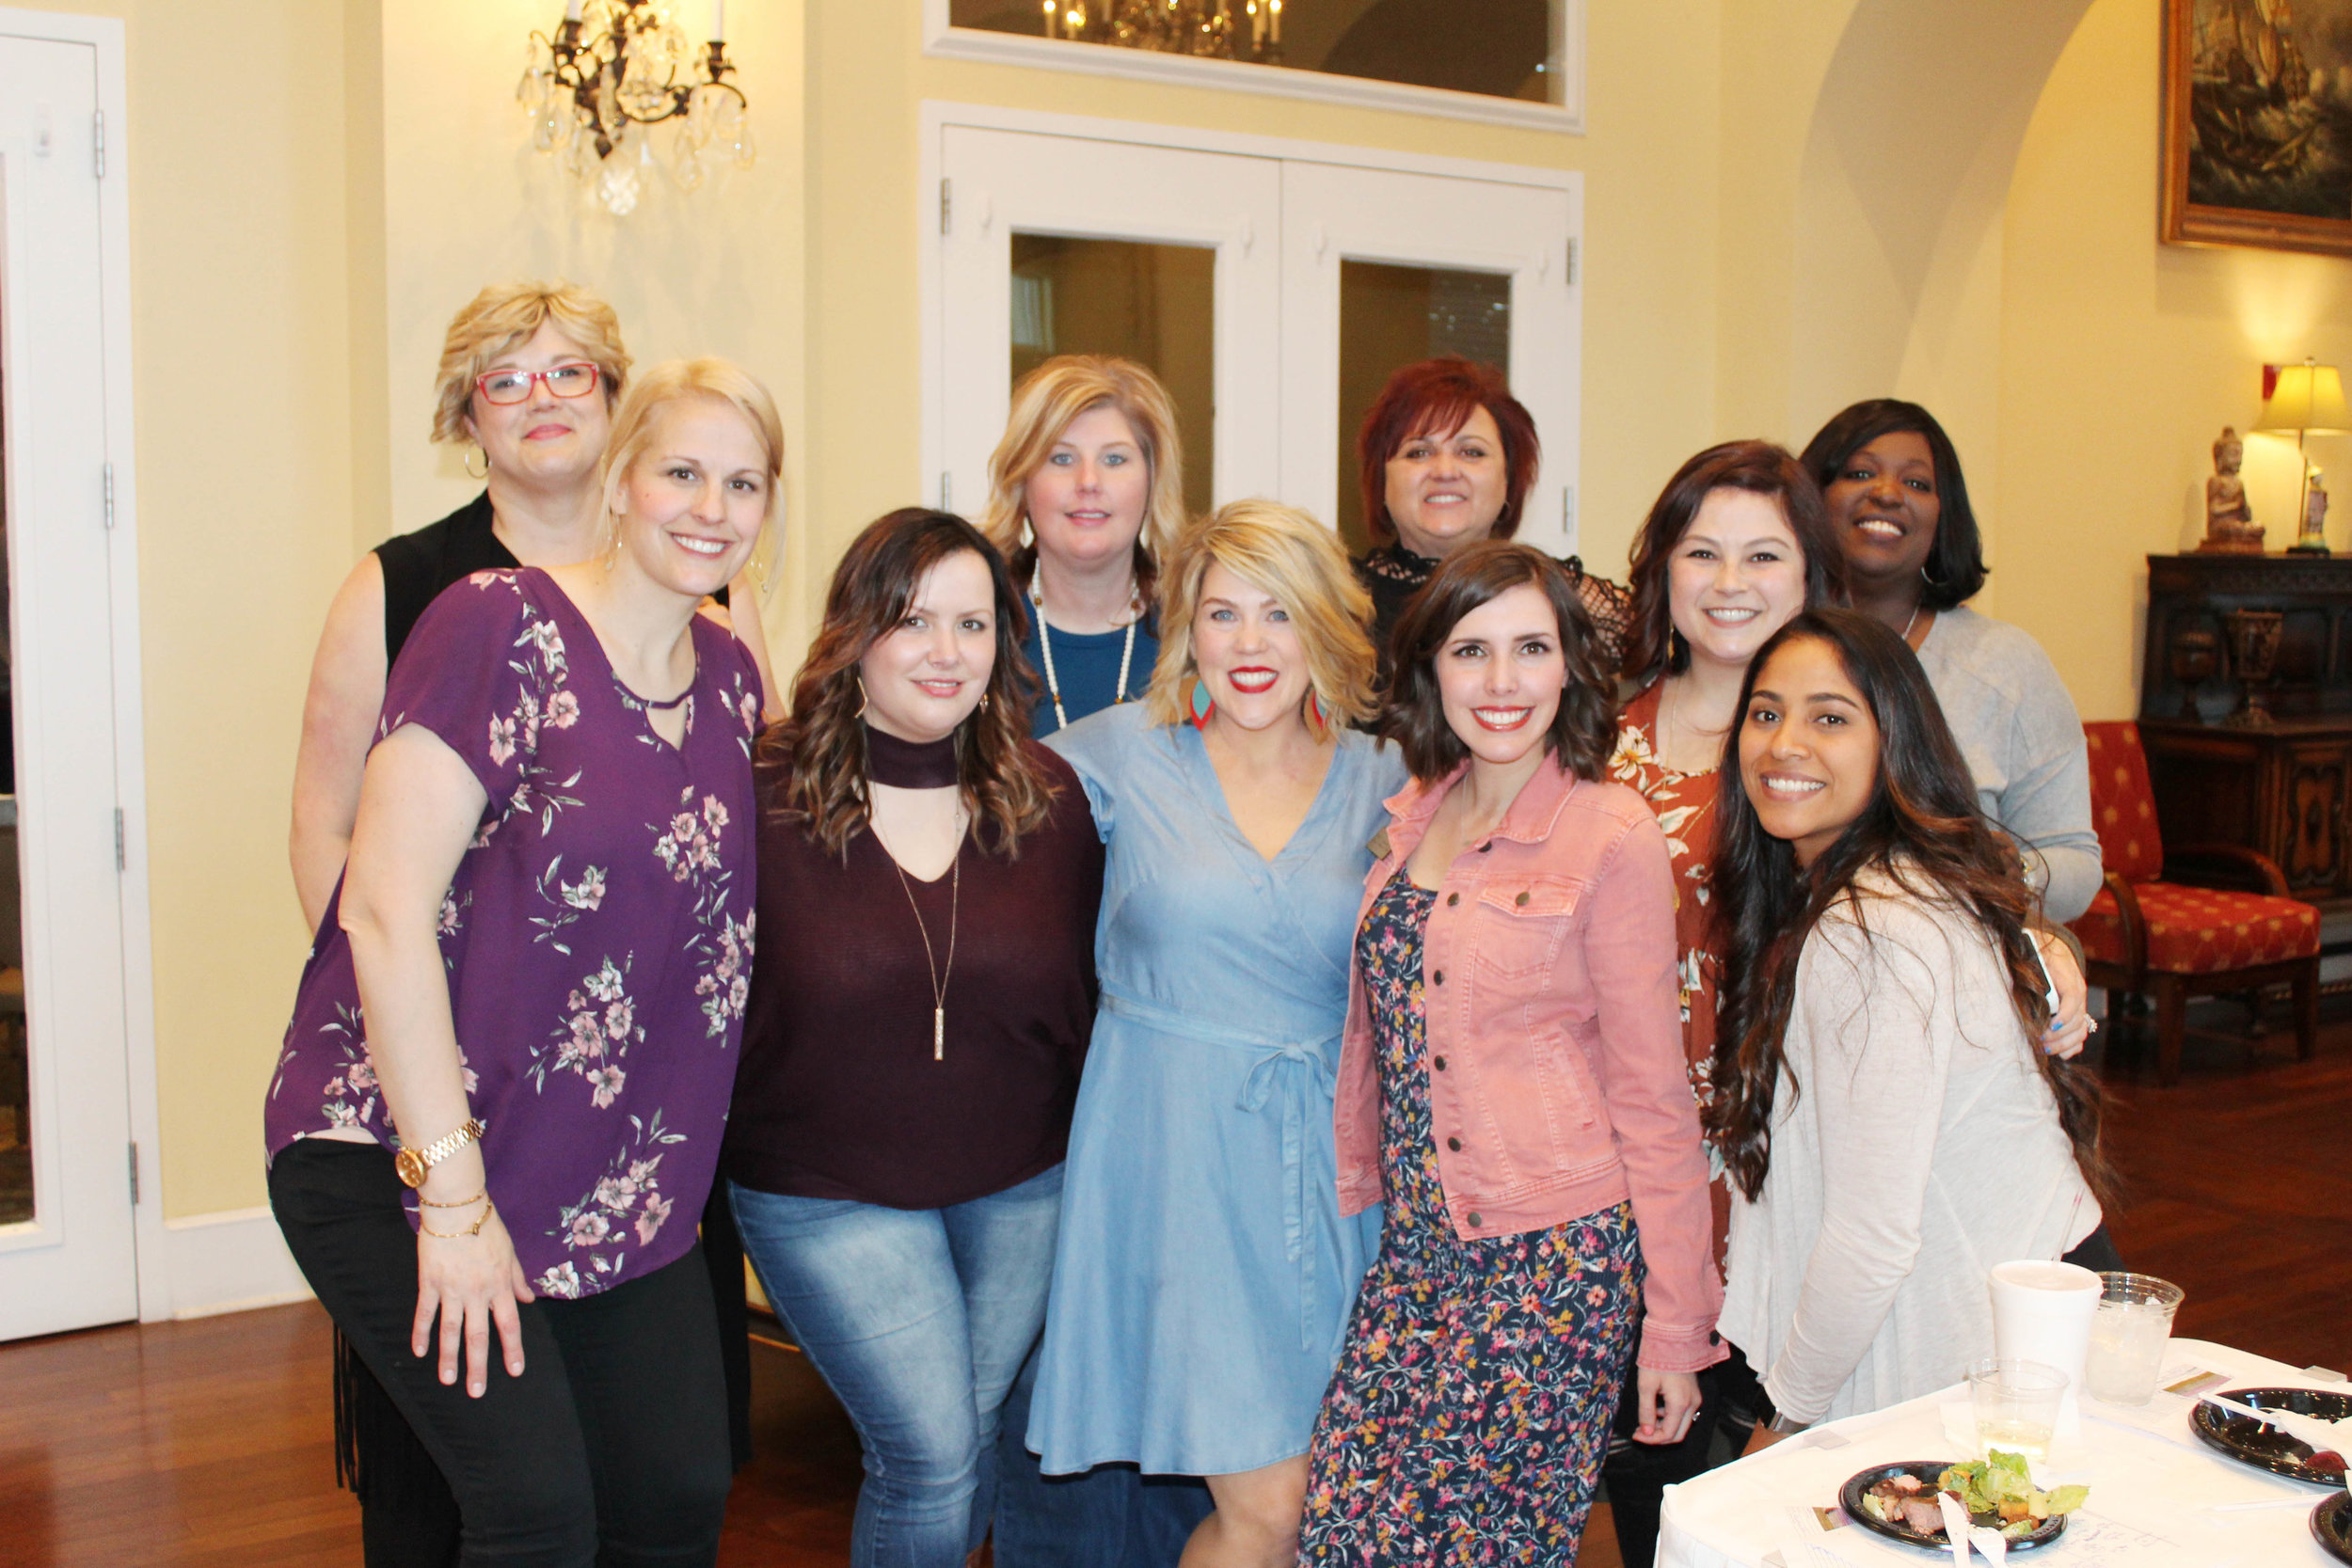 Joey Elliott, Maureen Fletcher, Jessica Kelley, Misty Honea, Brandy Eldridge, Malenda Cree, Kaleigh Dodson, Carly Rhyne, Marlene Magallon and Meah Wilson